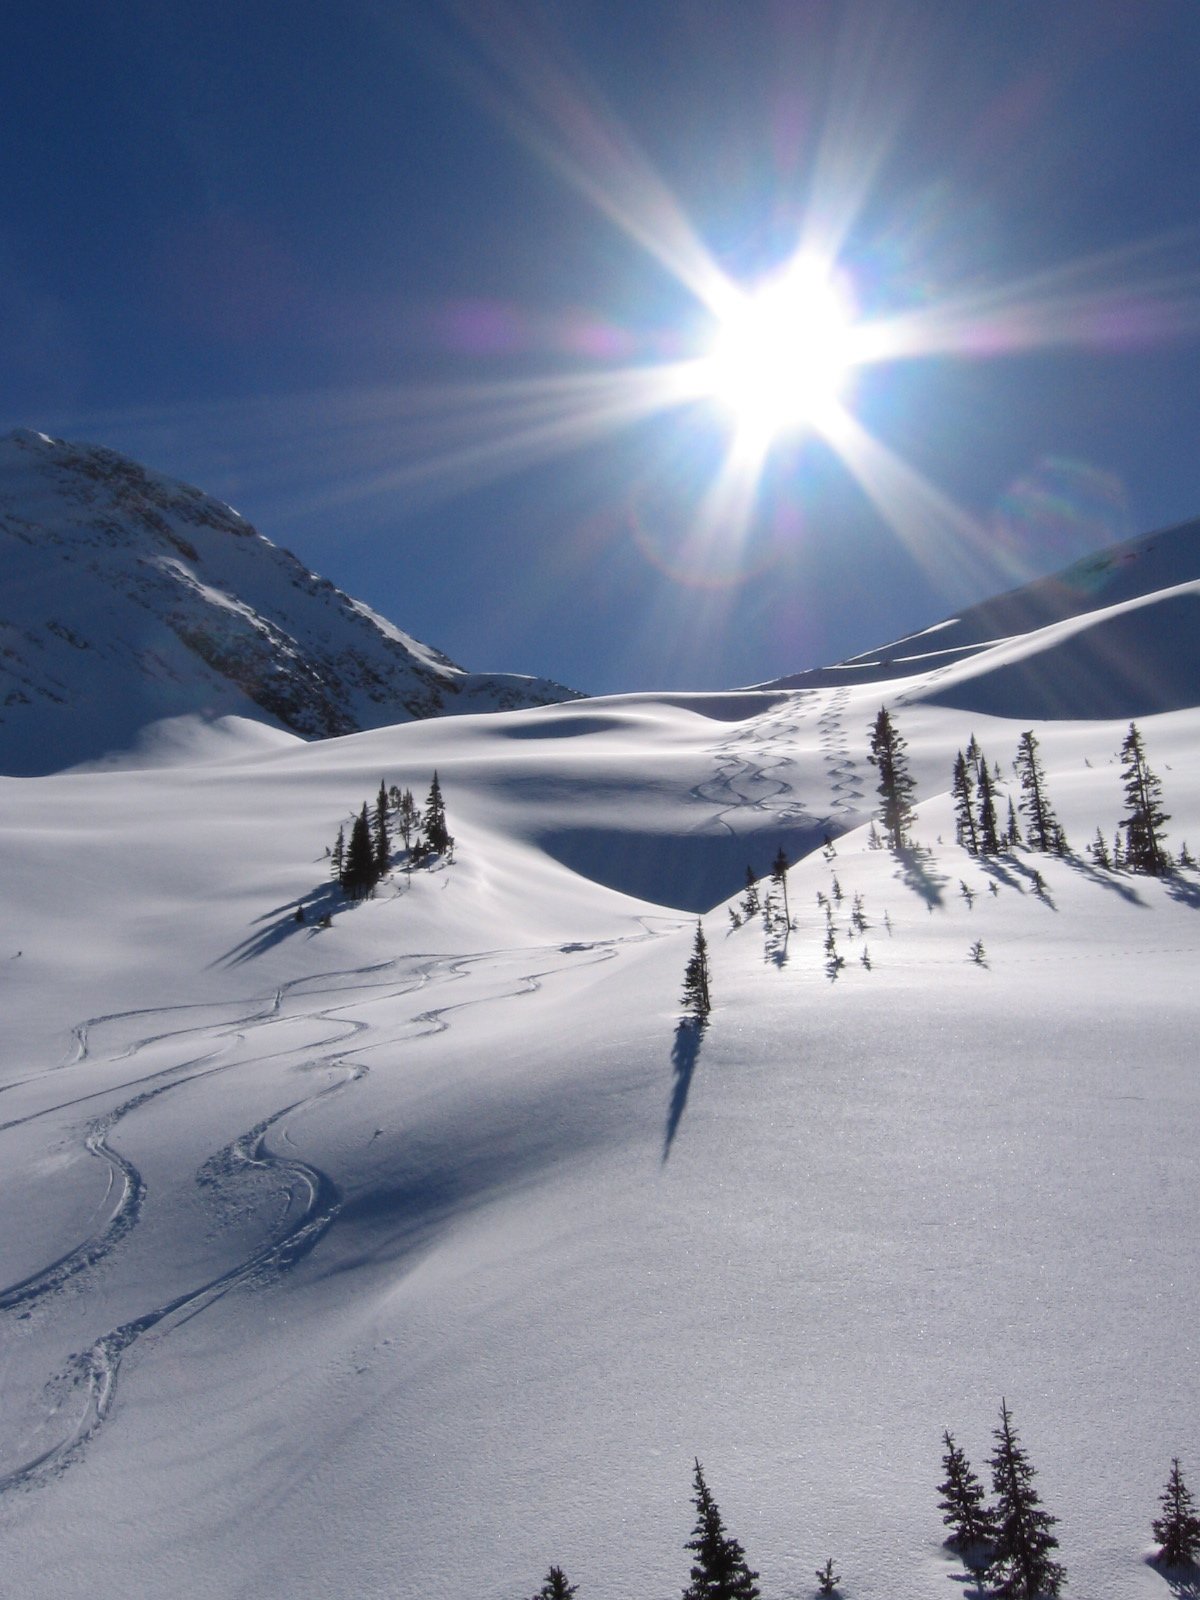 bearpaw heli-skiing powder skiing